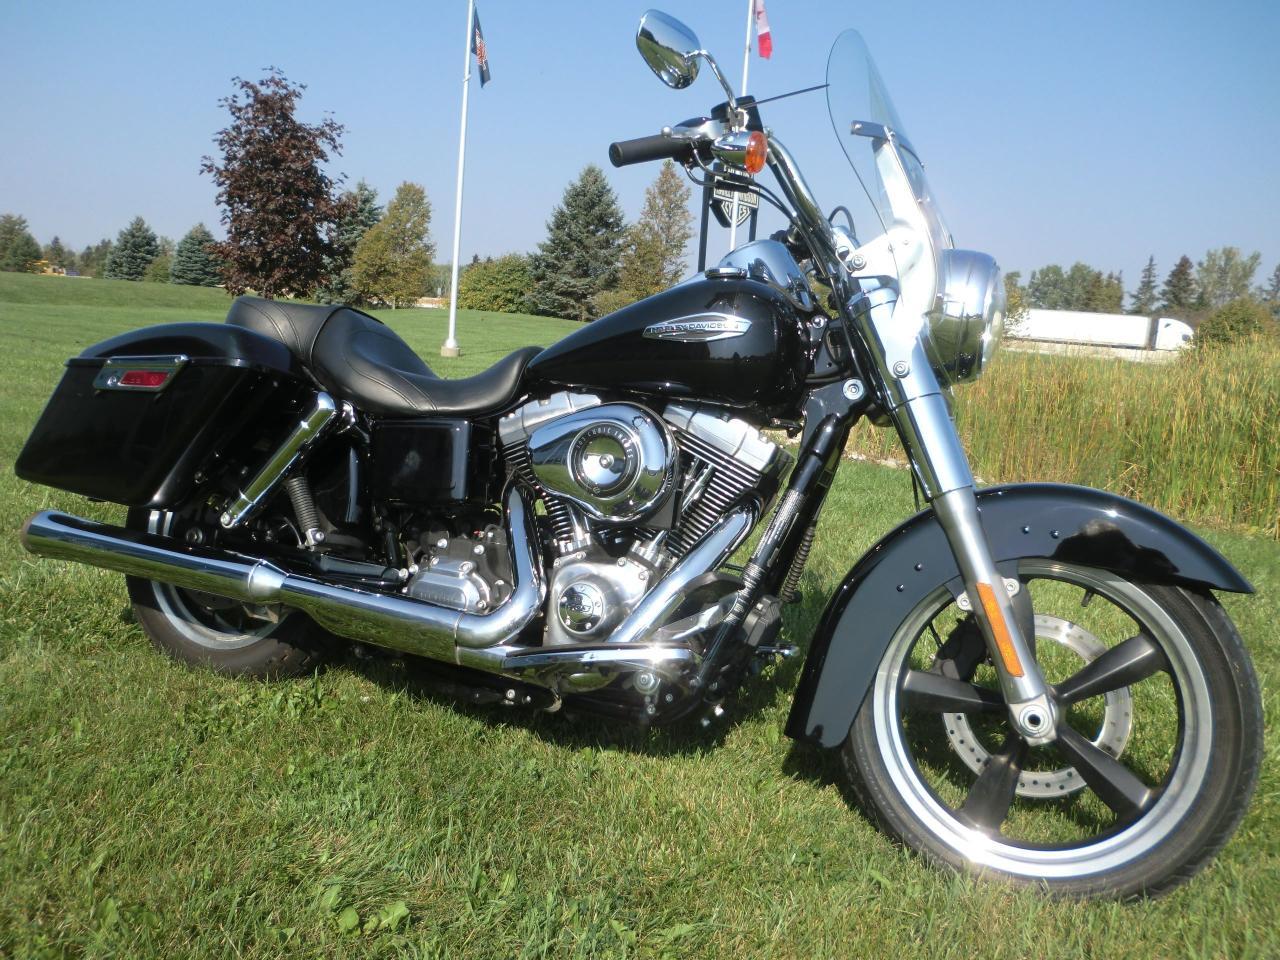 2012 Harley-Davidson Switchback FLD DYNA SWITCHBACK